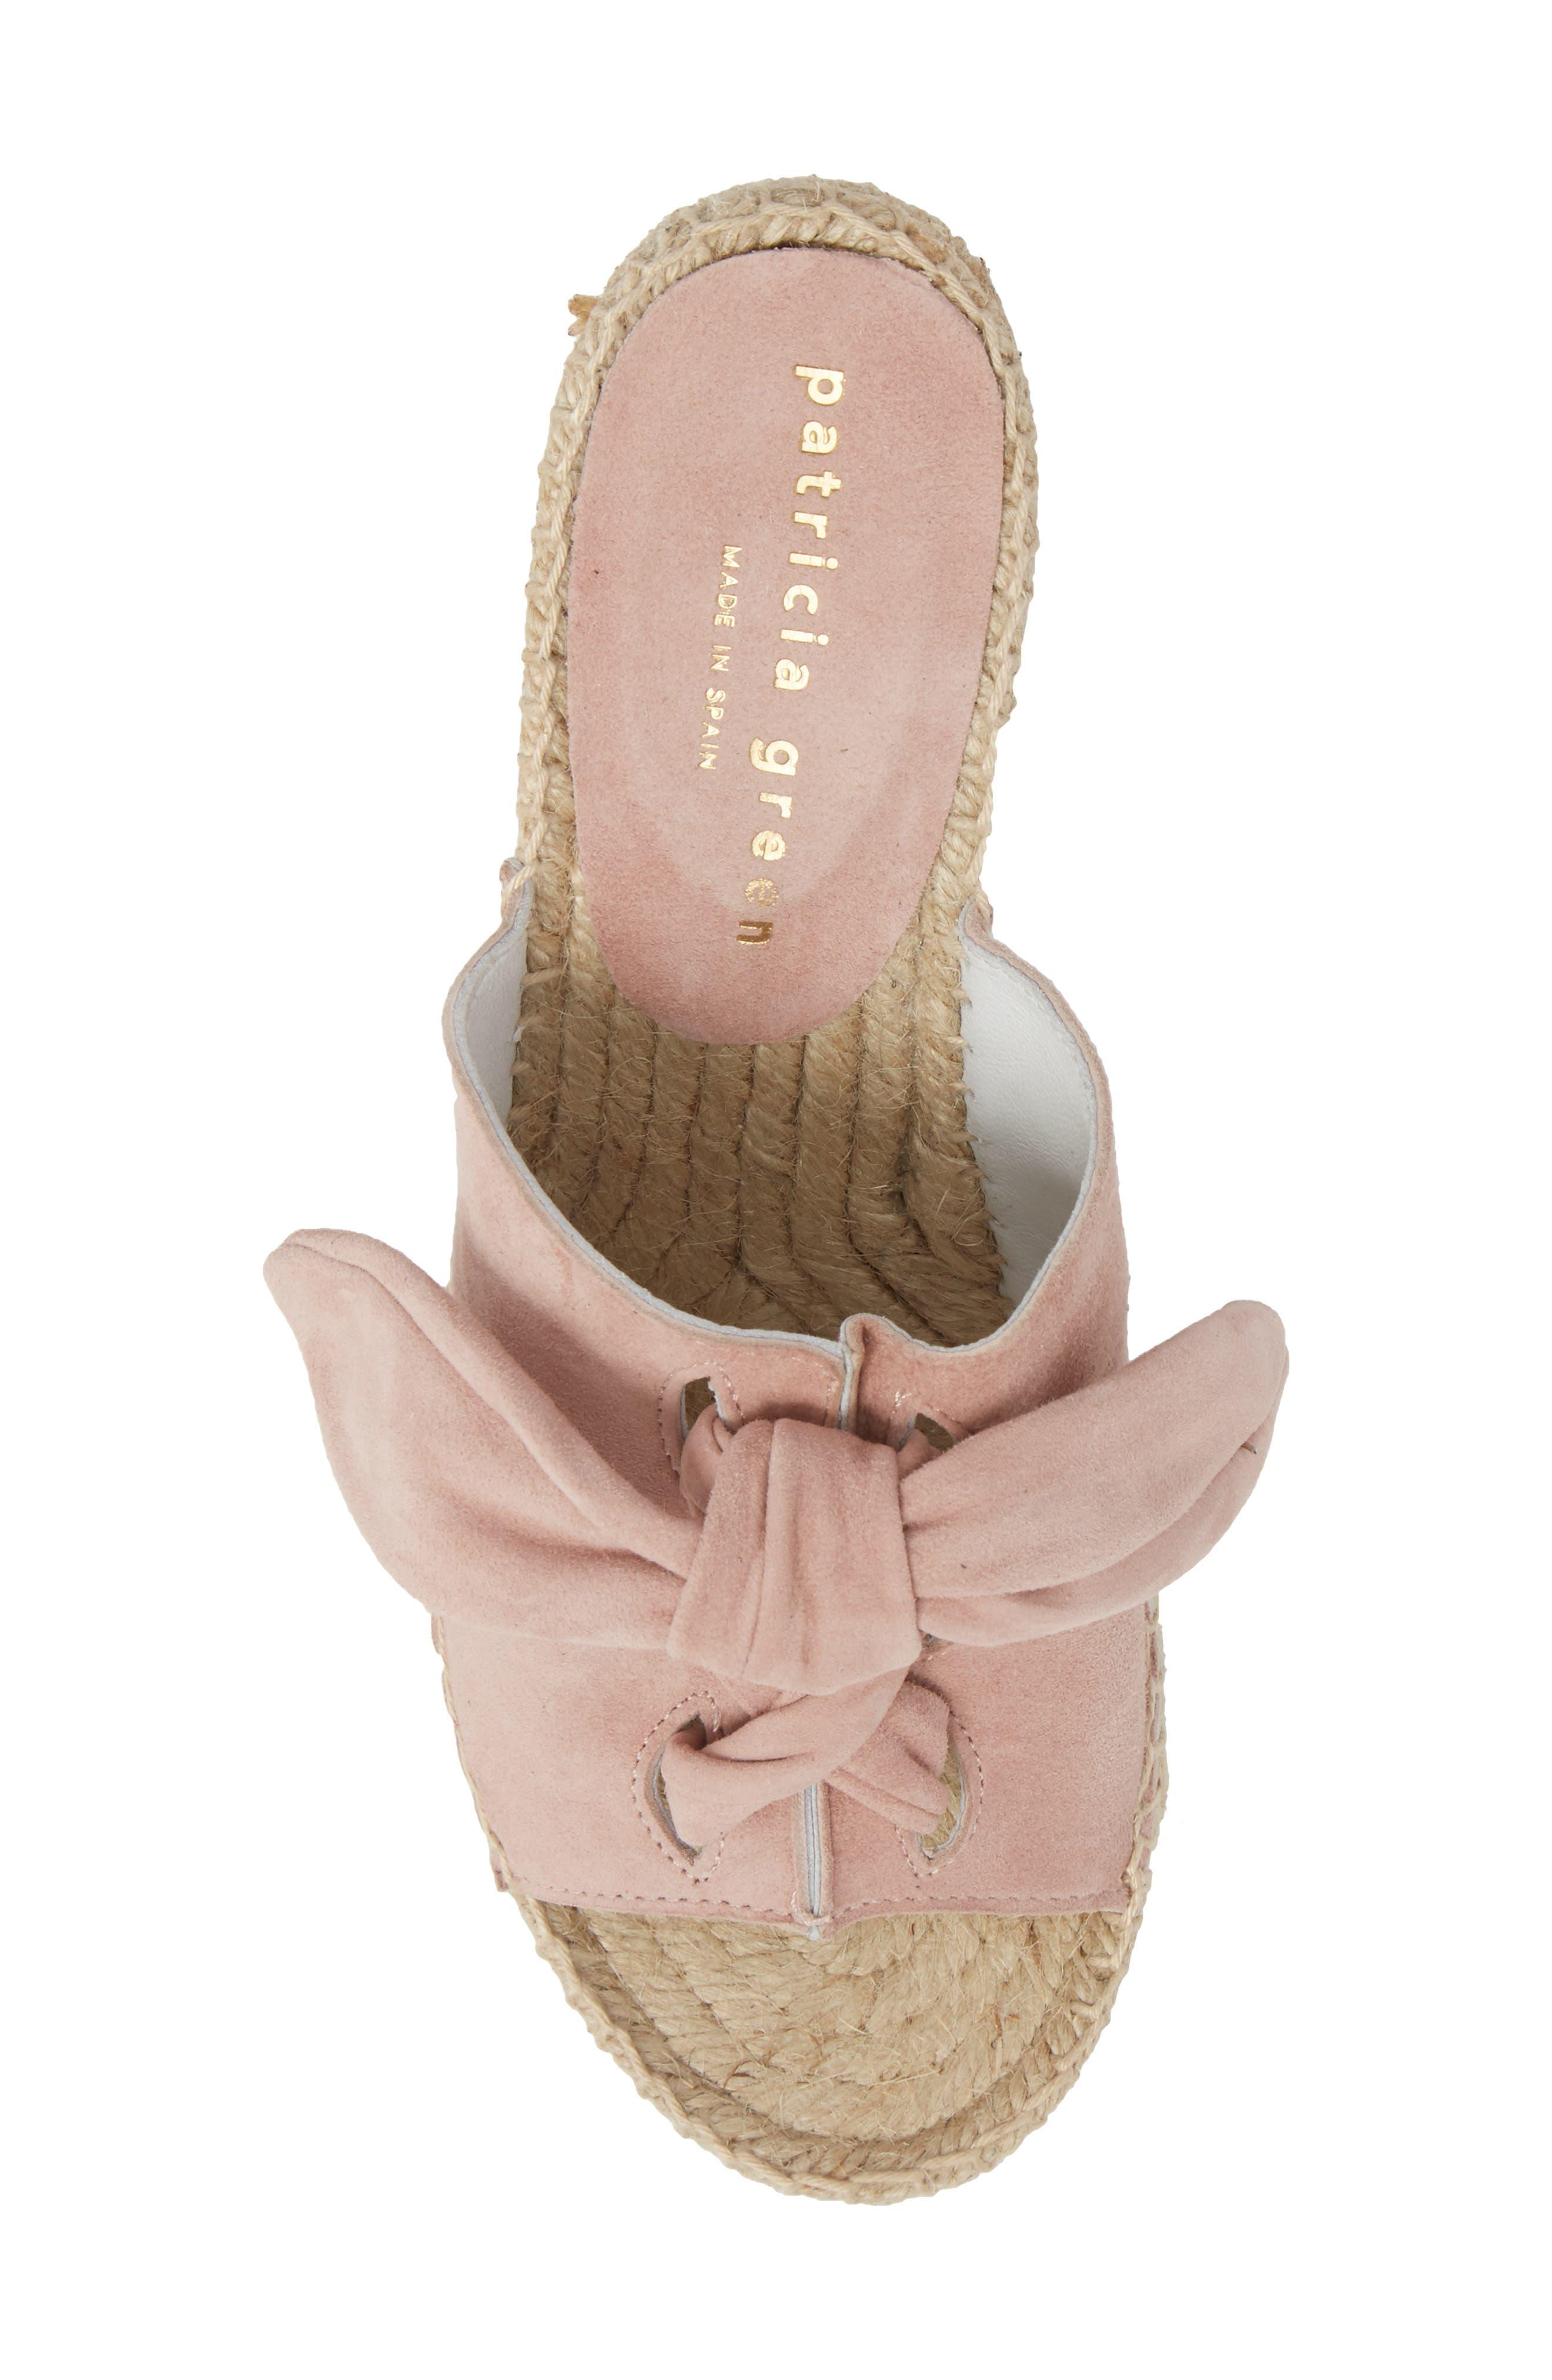 Flirt Espadrille Wedge Sandal,                             Alternate thumbnail 5, color,                             Pink Suede